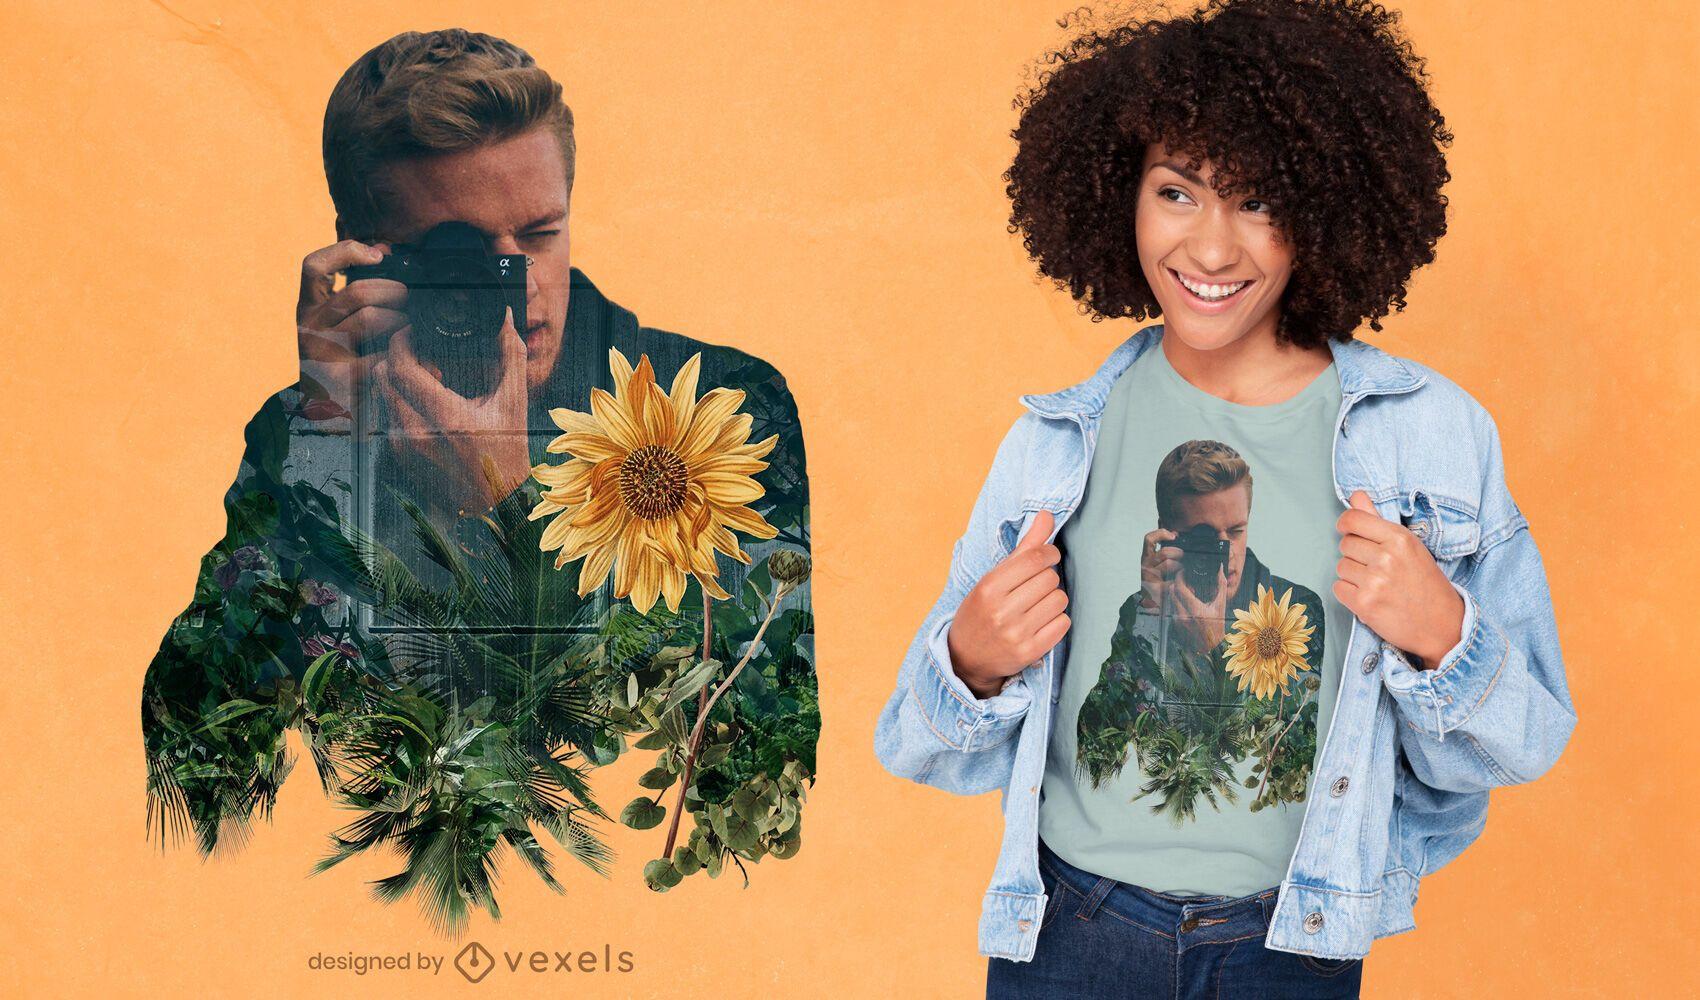 Fot?grafo y dise?o de camiseta de doble exposici?n de flores.